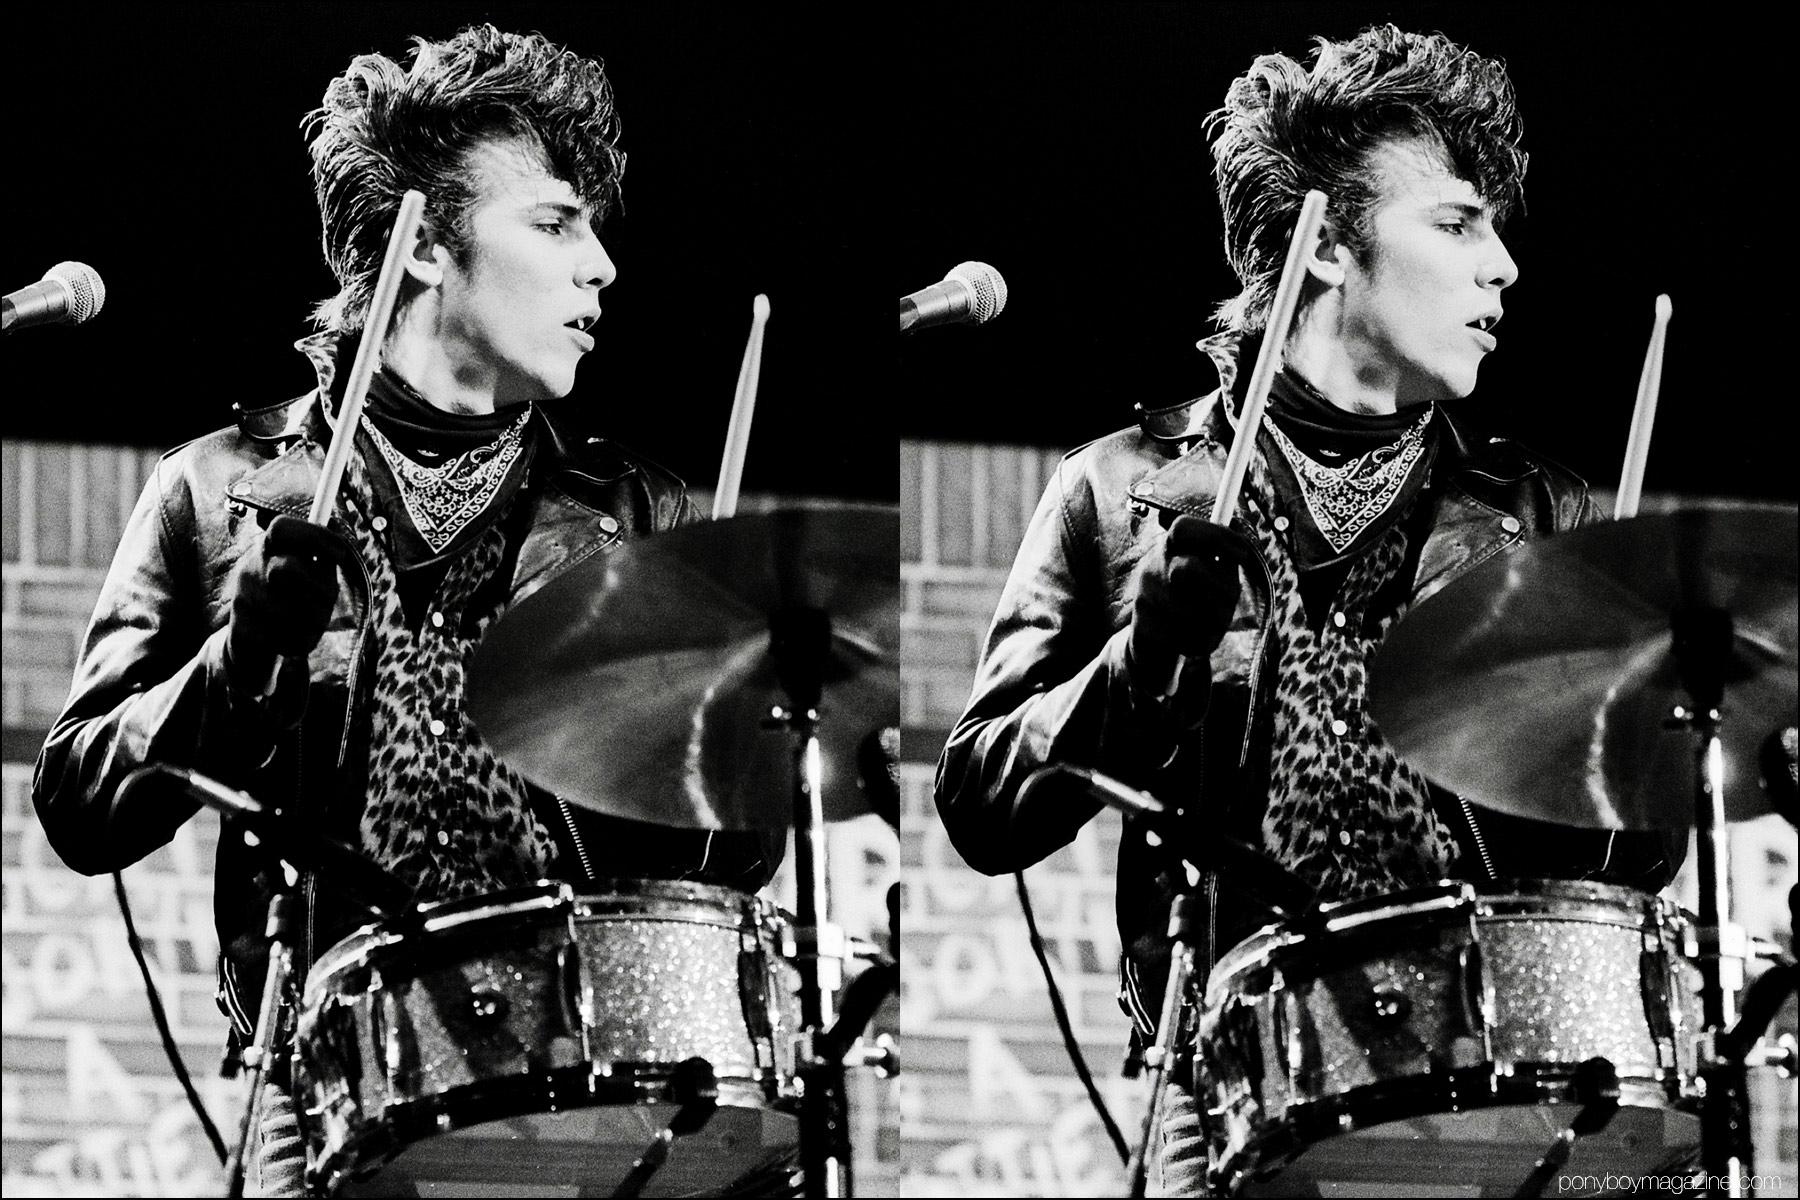 1980's neo-rockabilly drummer Slim Jim Phantom photographed onstage in Germany by Manfred Becker. Ponyboy magazine NY.